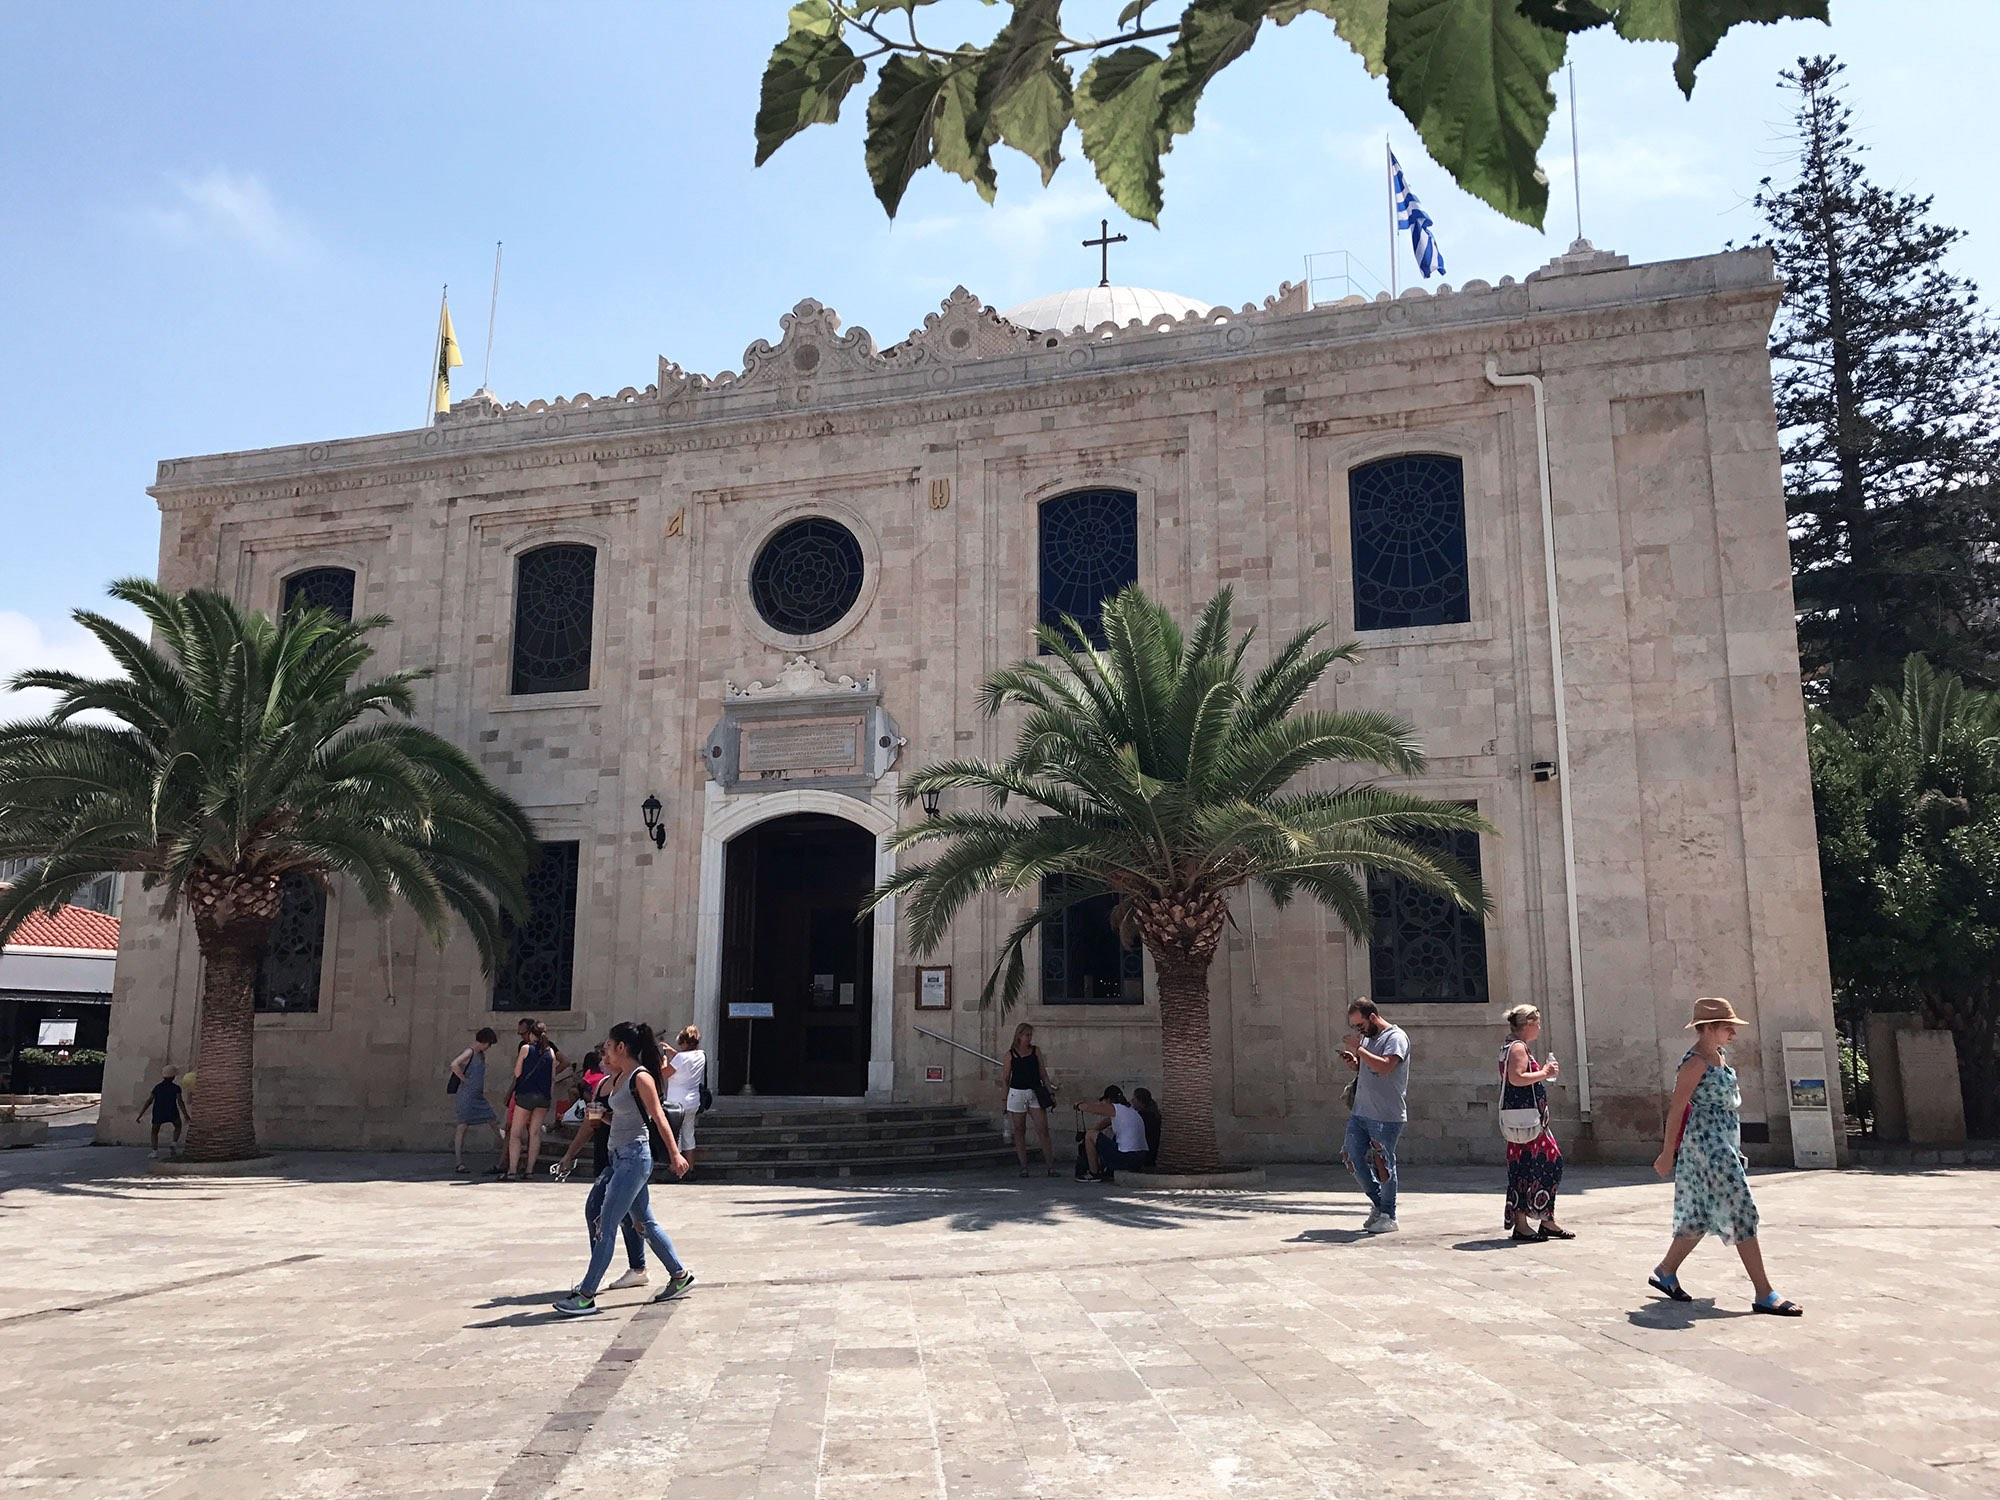 Heraklion Crete, Greece | Top 8 Experiences from Road Tripping Crete, Greece